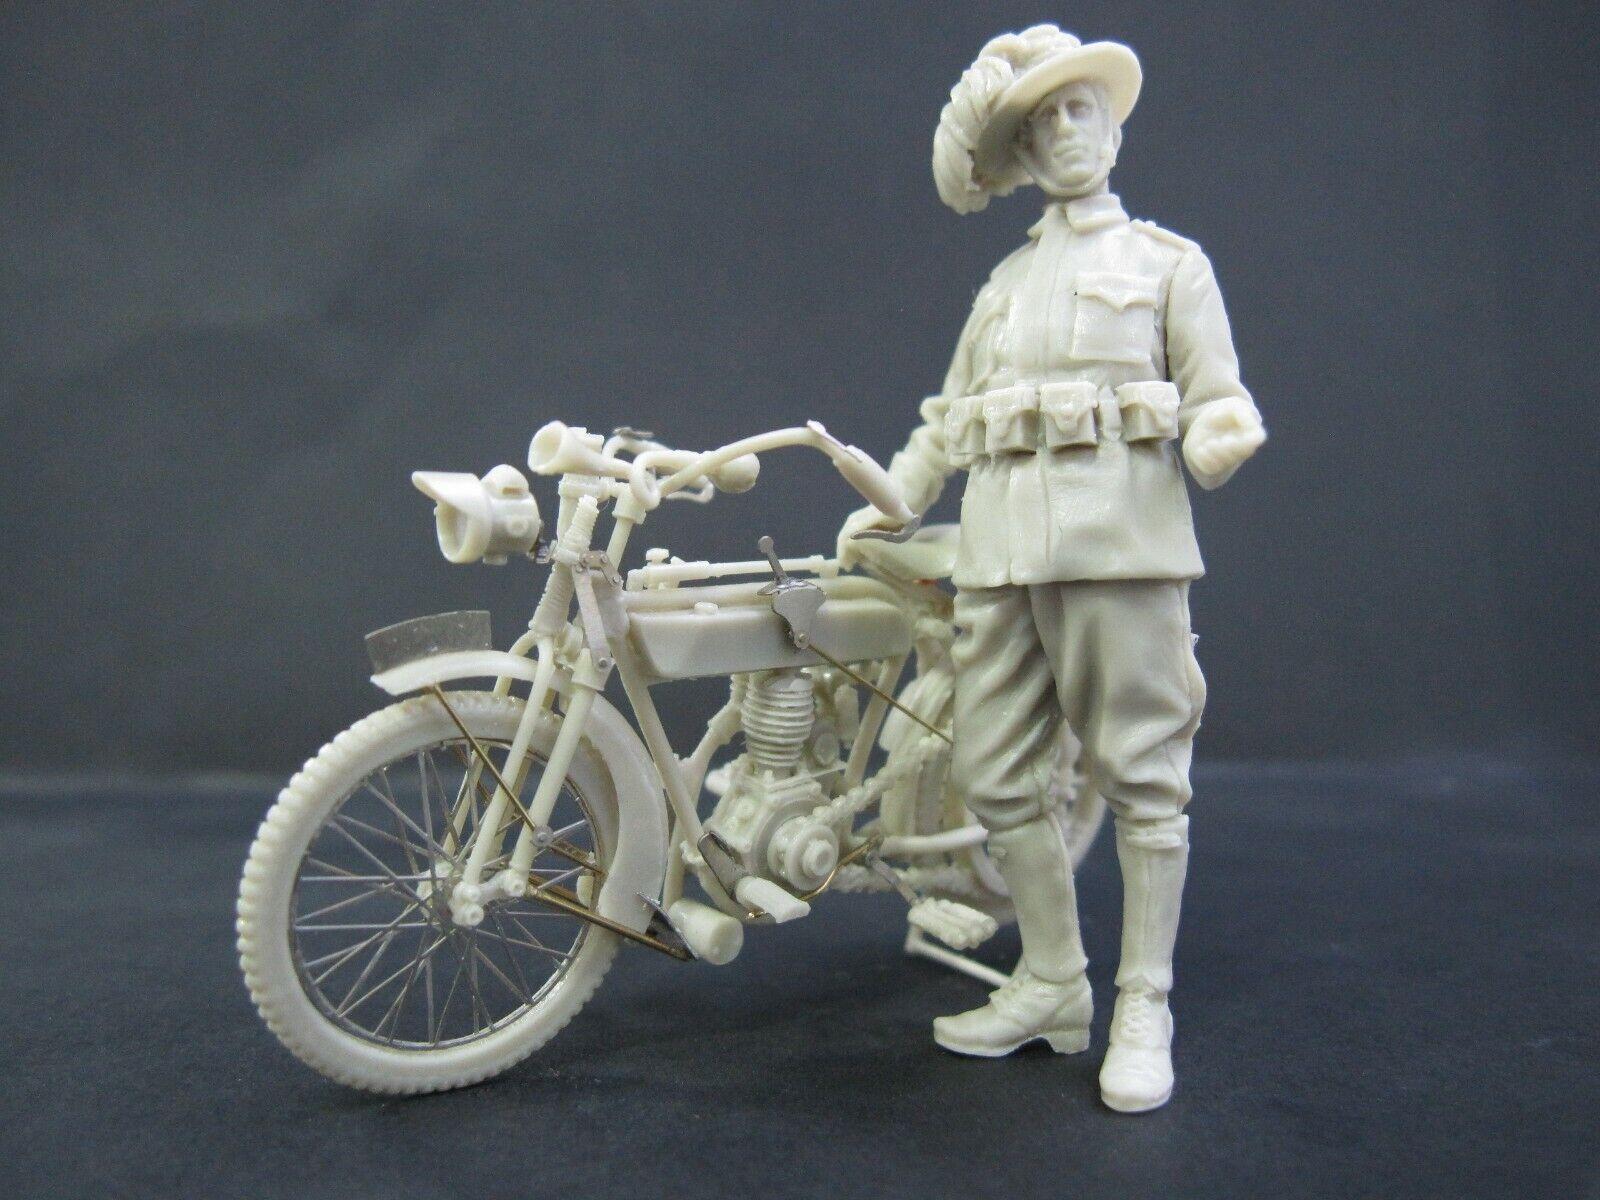 WWI FRERA 1914 Military Version Motorcycle & Pilot 1 35 Cix.Models Resin CixM019